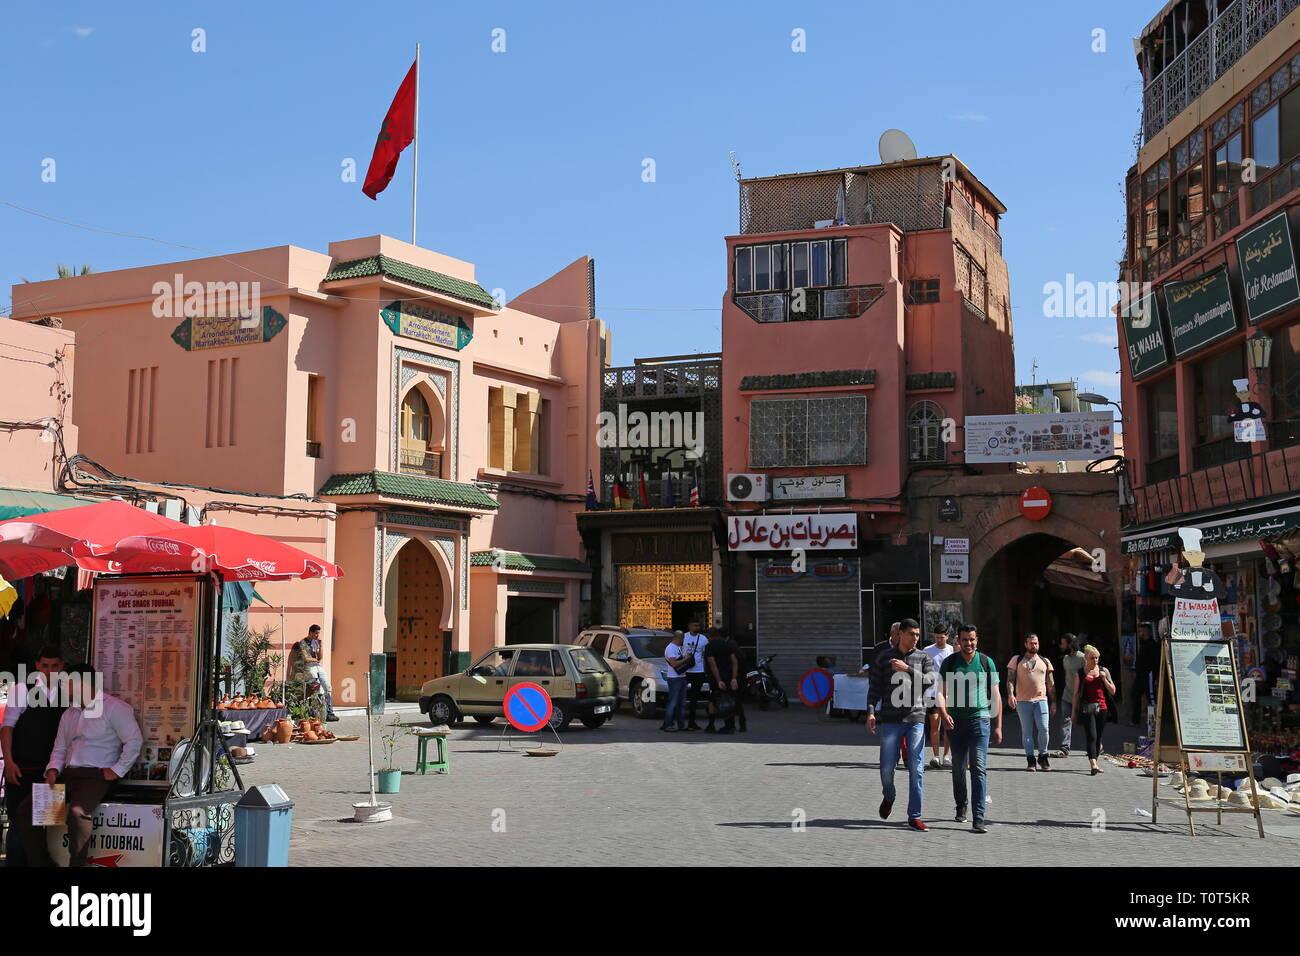 Jemaa el Fna, Medina, Marrakesh, Marrakesh-Safi region, Morocco, north Africa Stock Photo